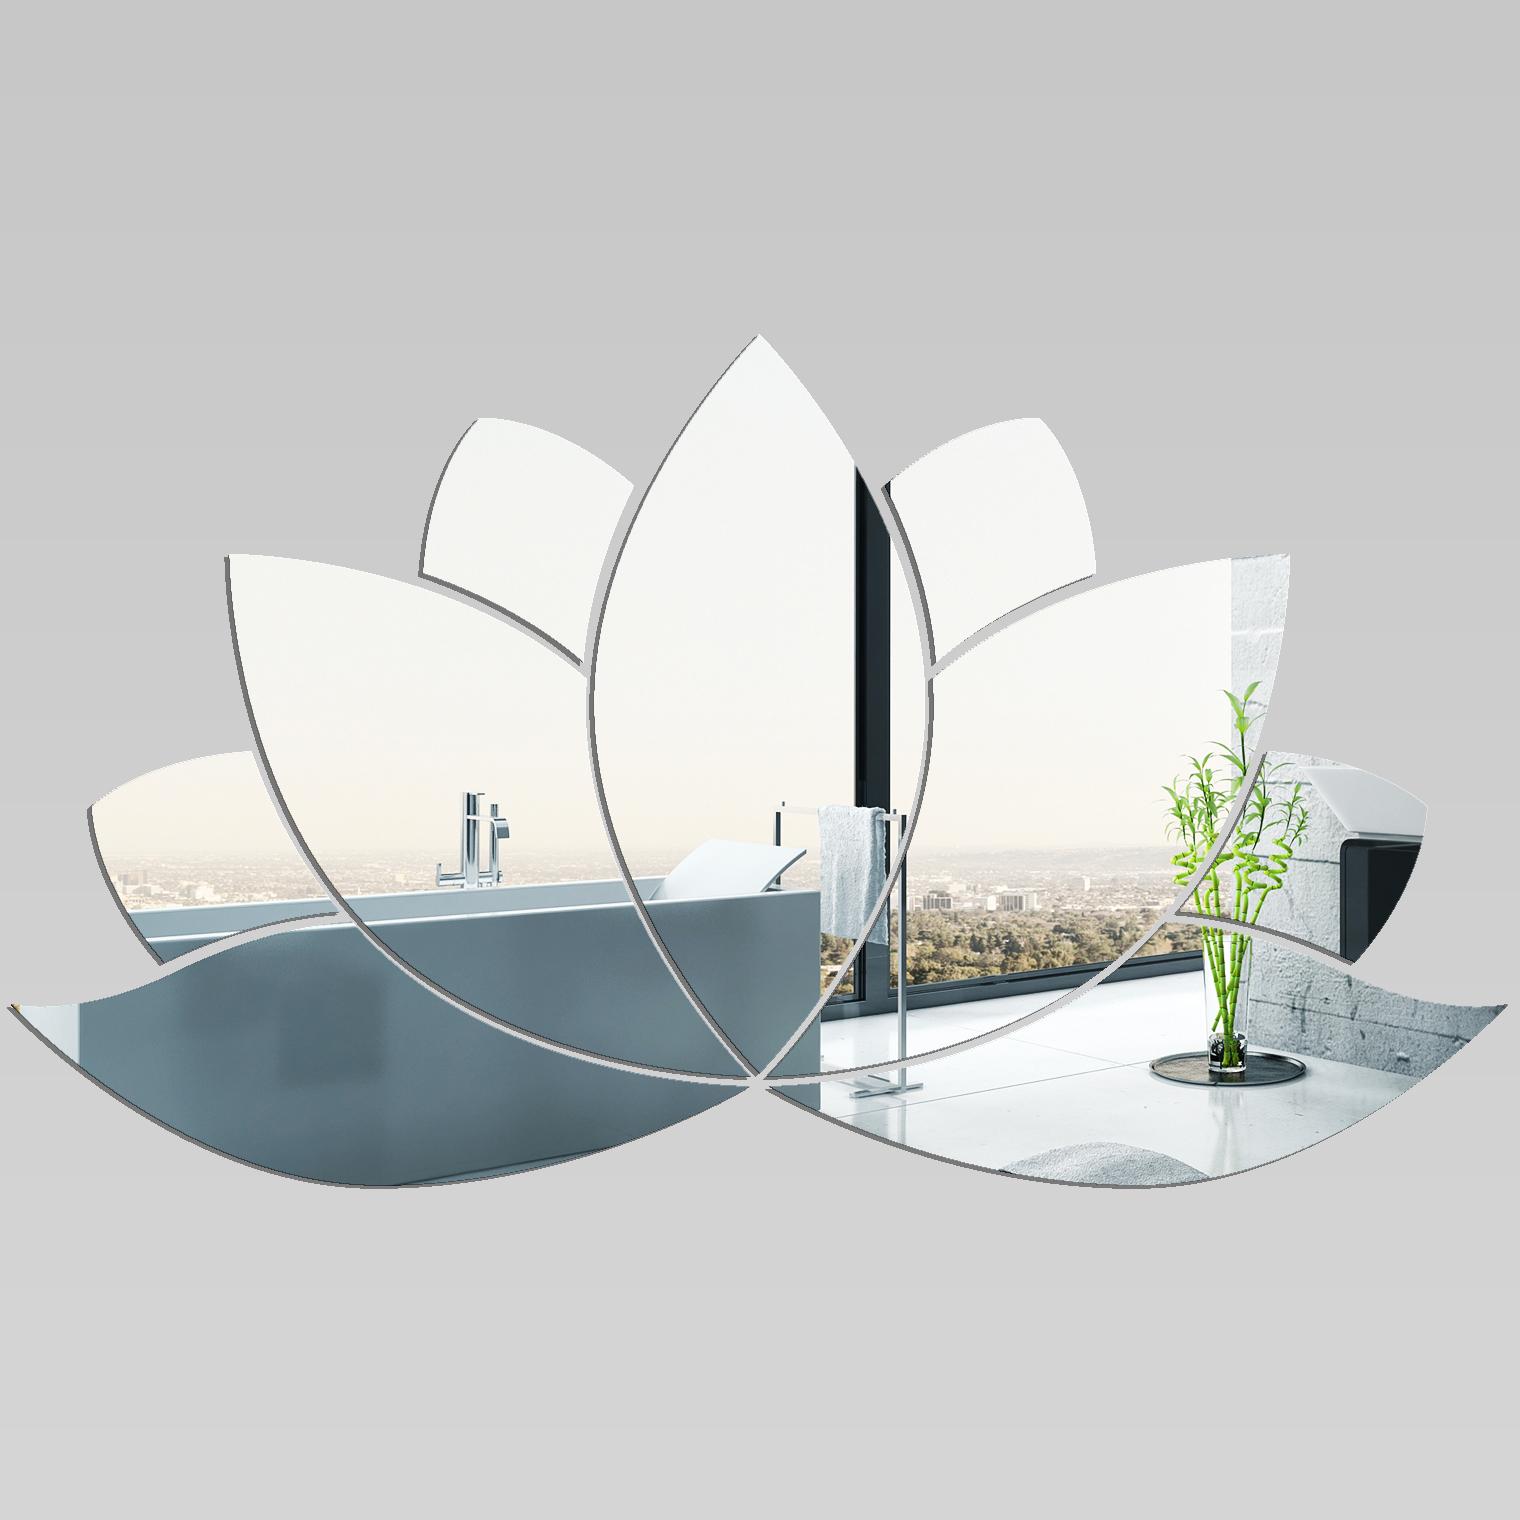 miroir plexiglass acrylique n nuphar 1 pas cher